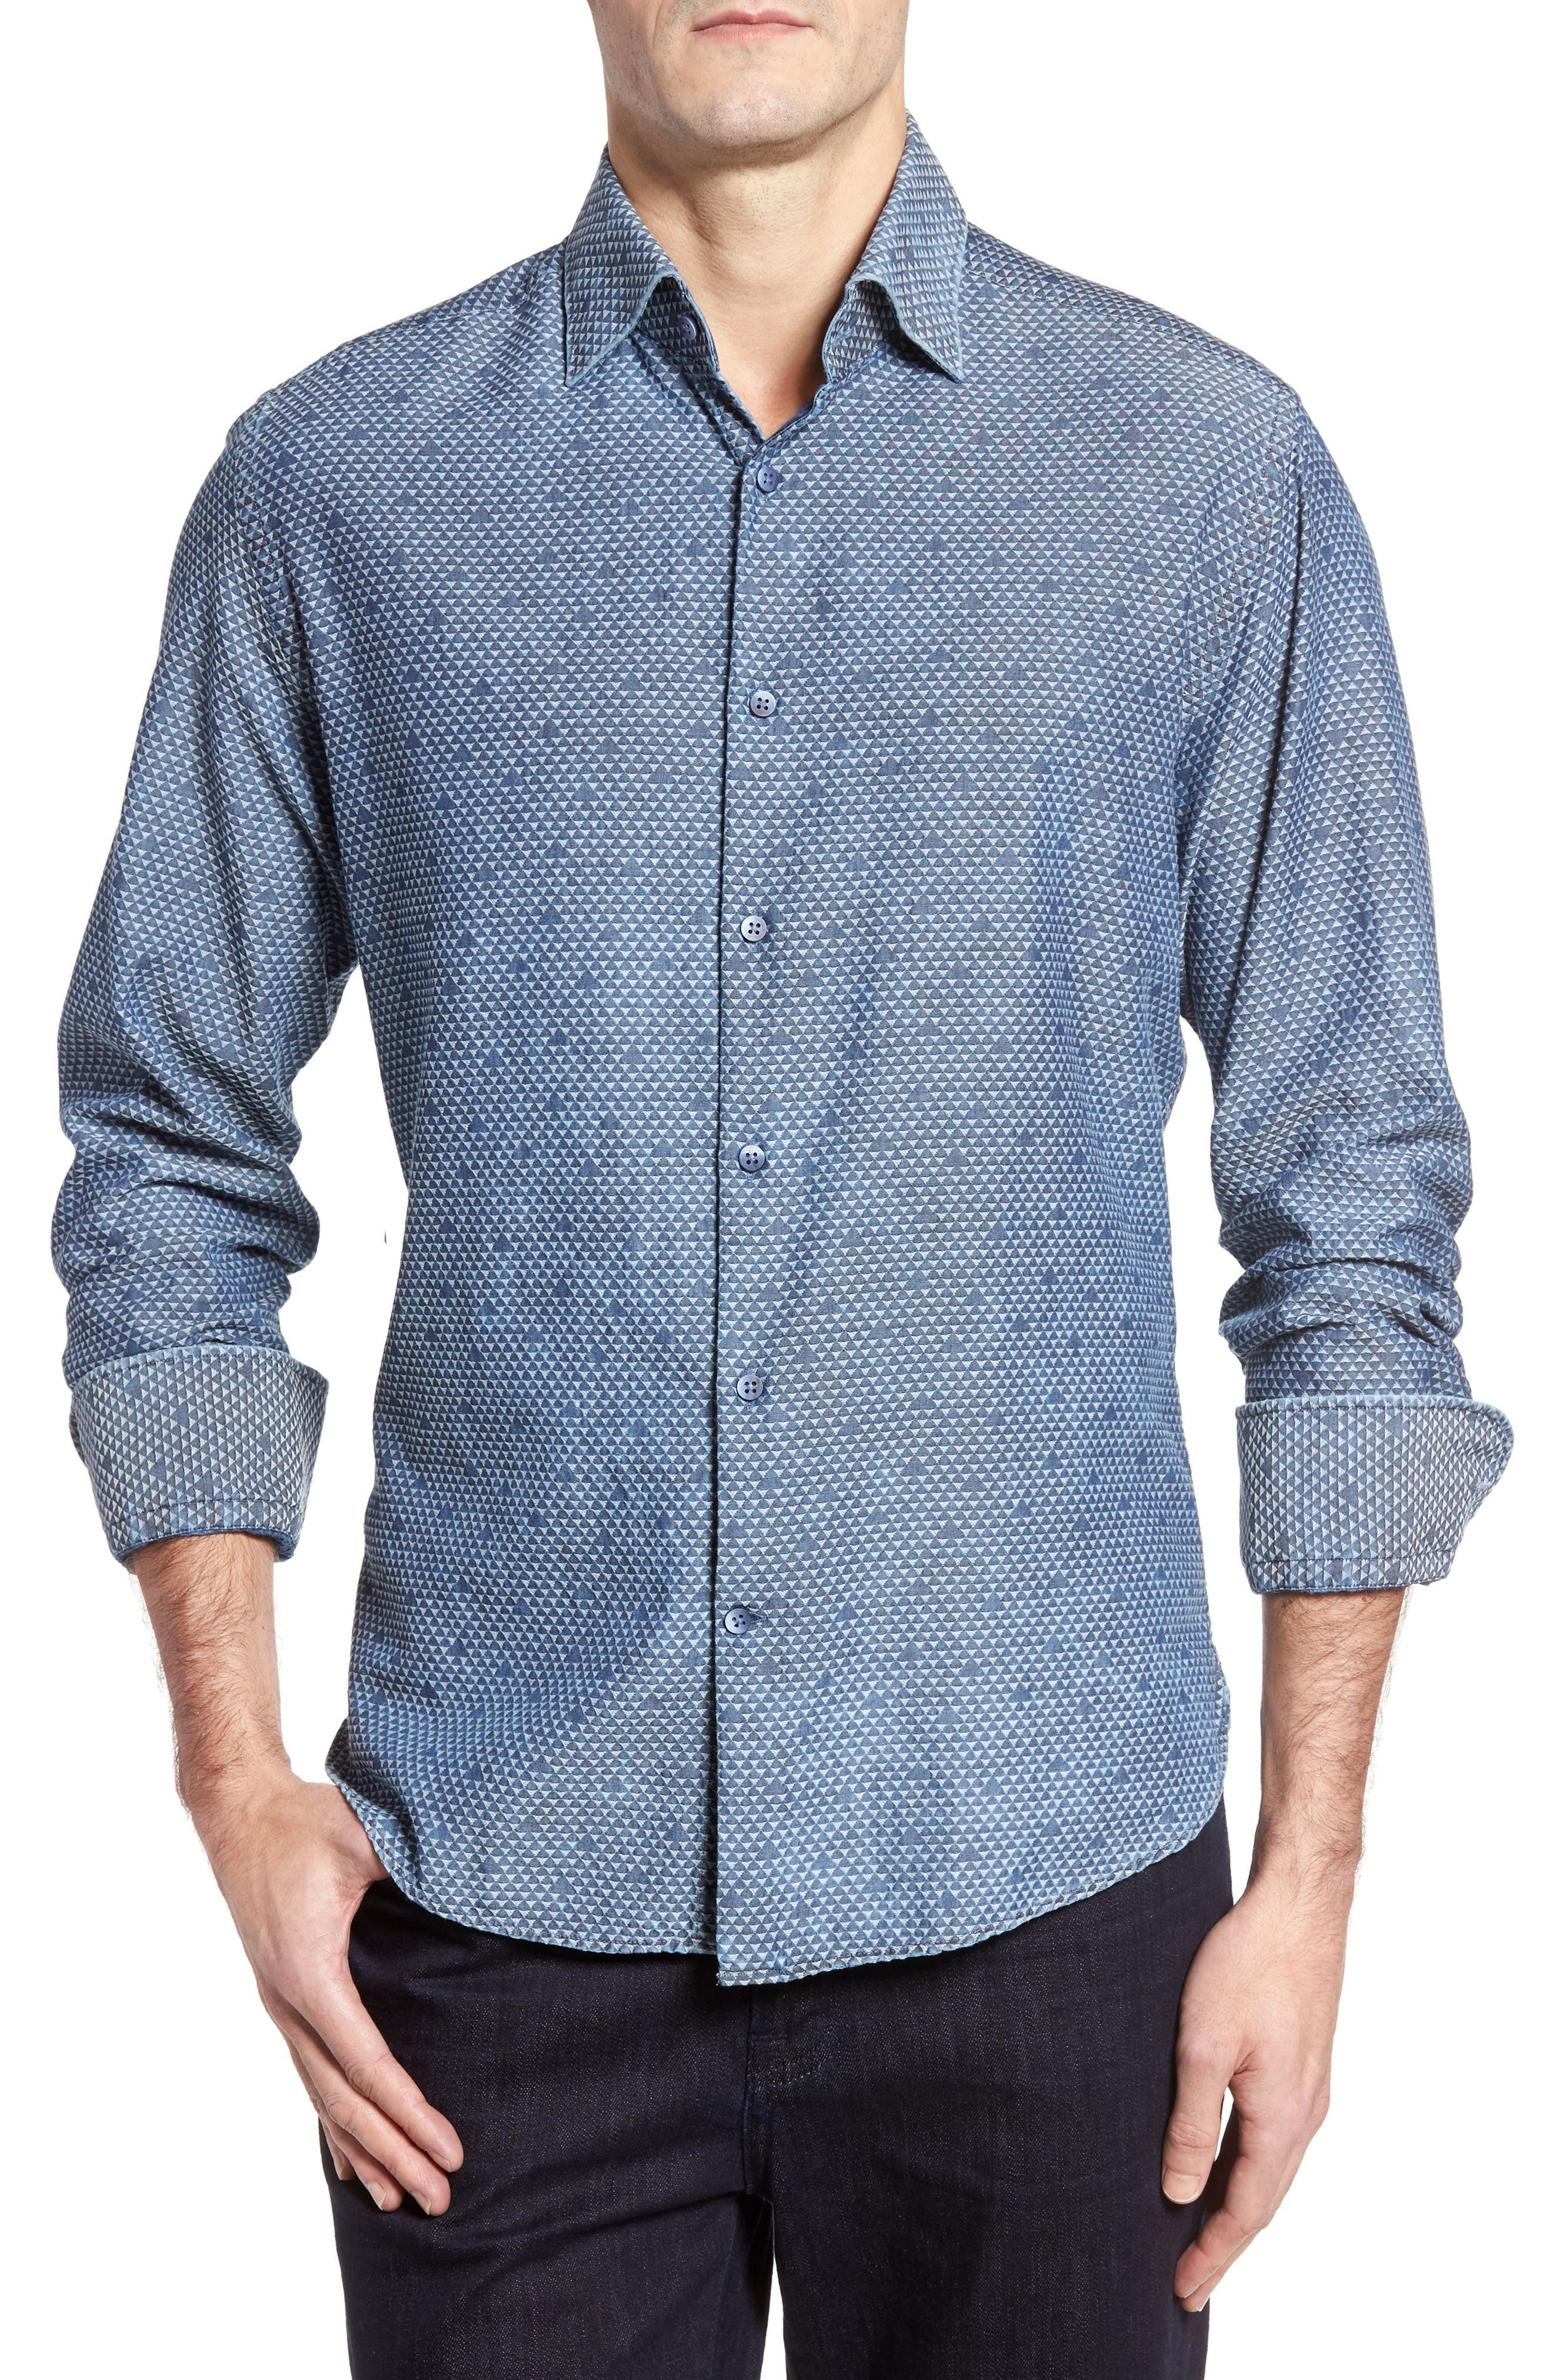 Alternate Image 1 Selected - Stone Rose Triangle Jacquard Sport Shirt